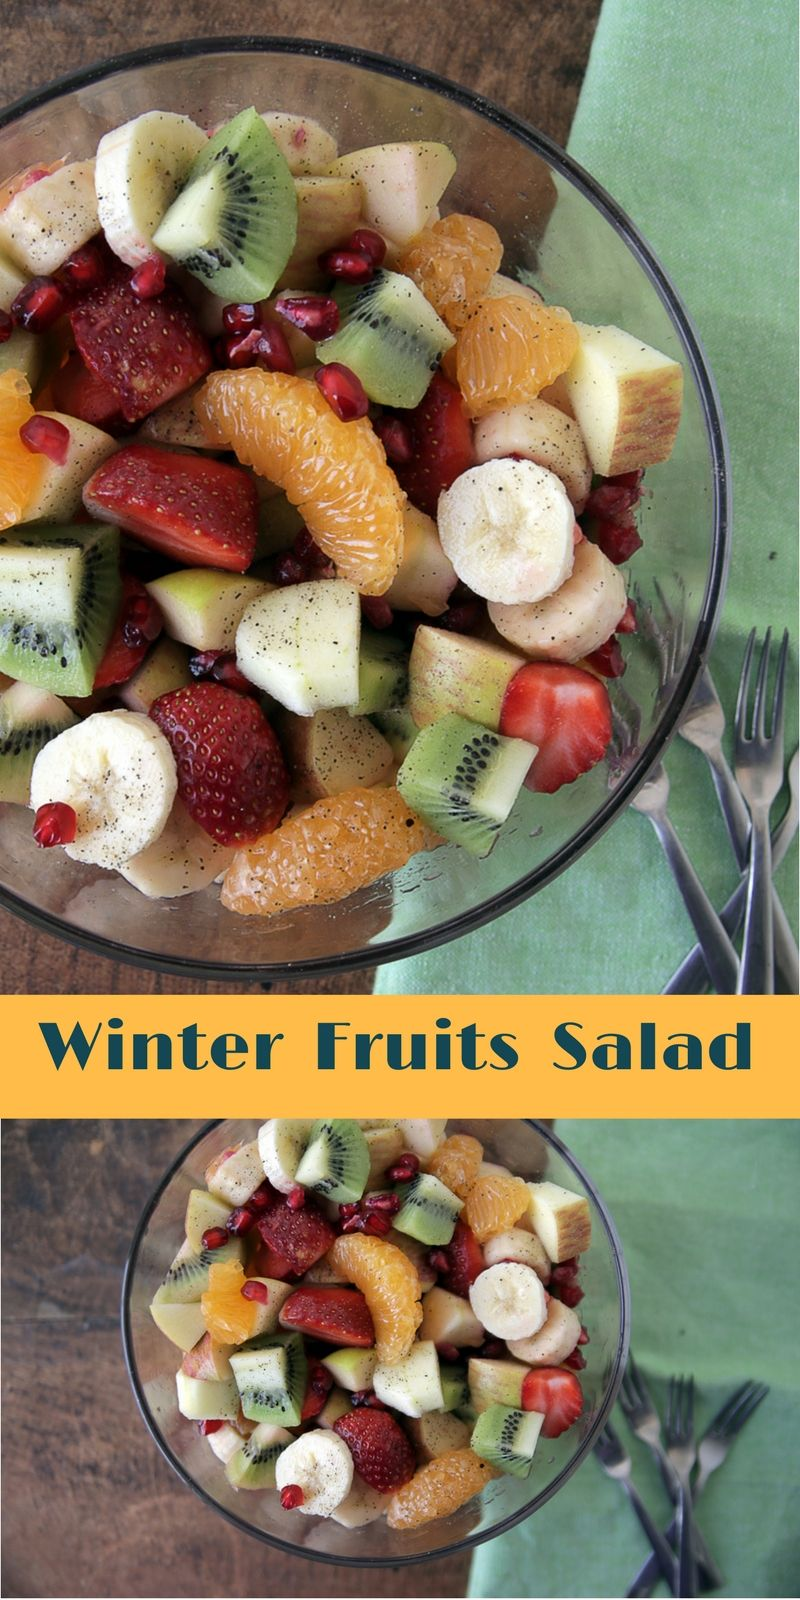 Winter Fruit Salad Recipe Recipe Winter Fruit Salad Chaat Healthy Snacks Recipes